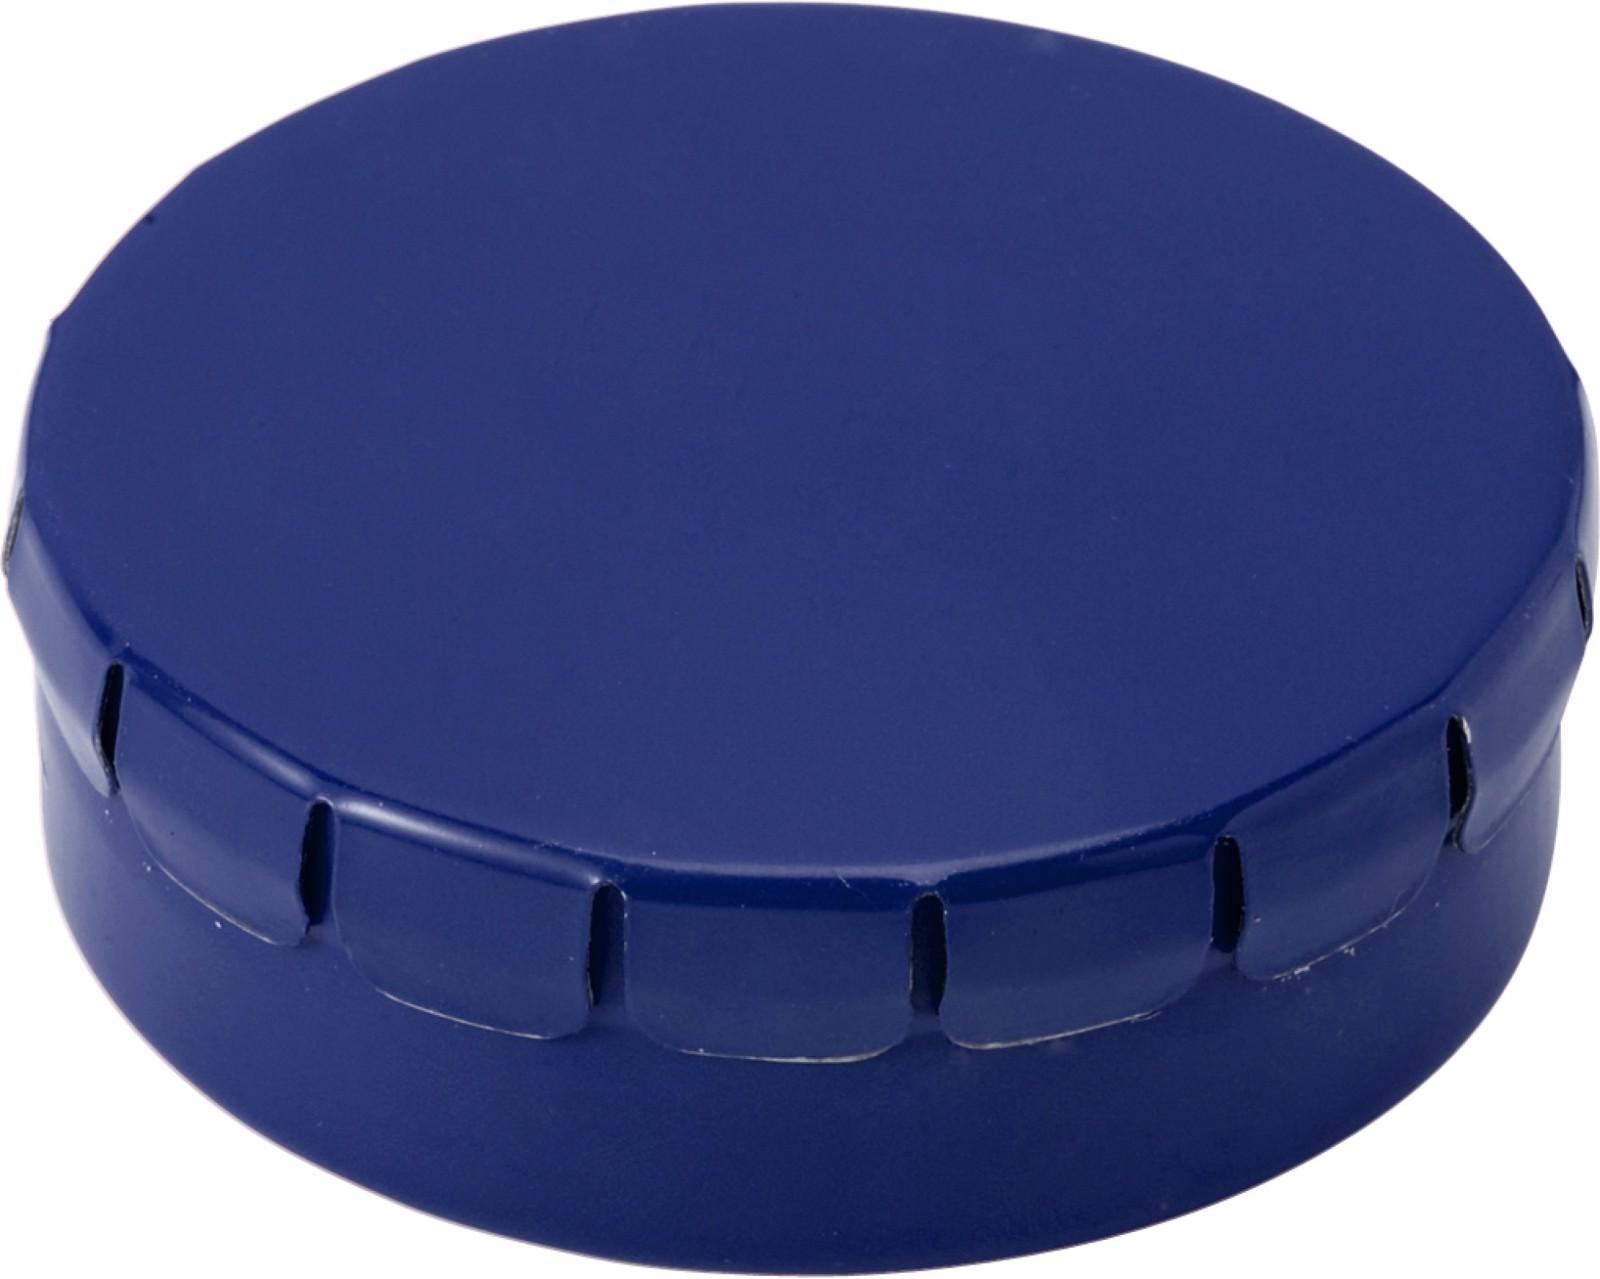 Tin with mints - Cobalt Blue